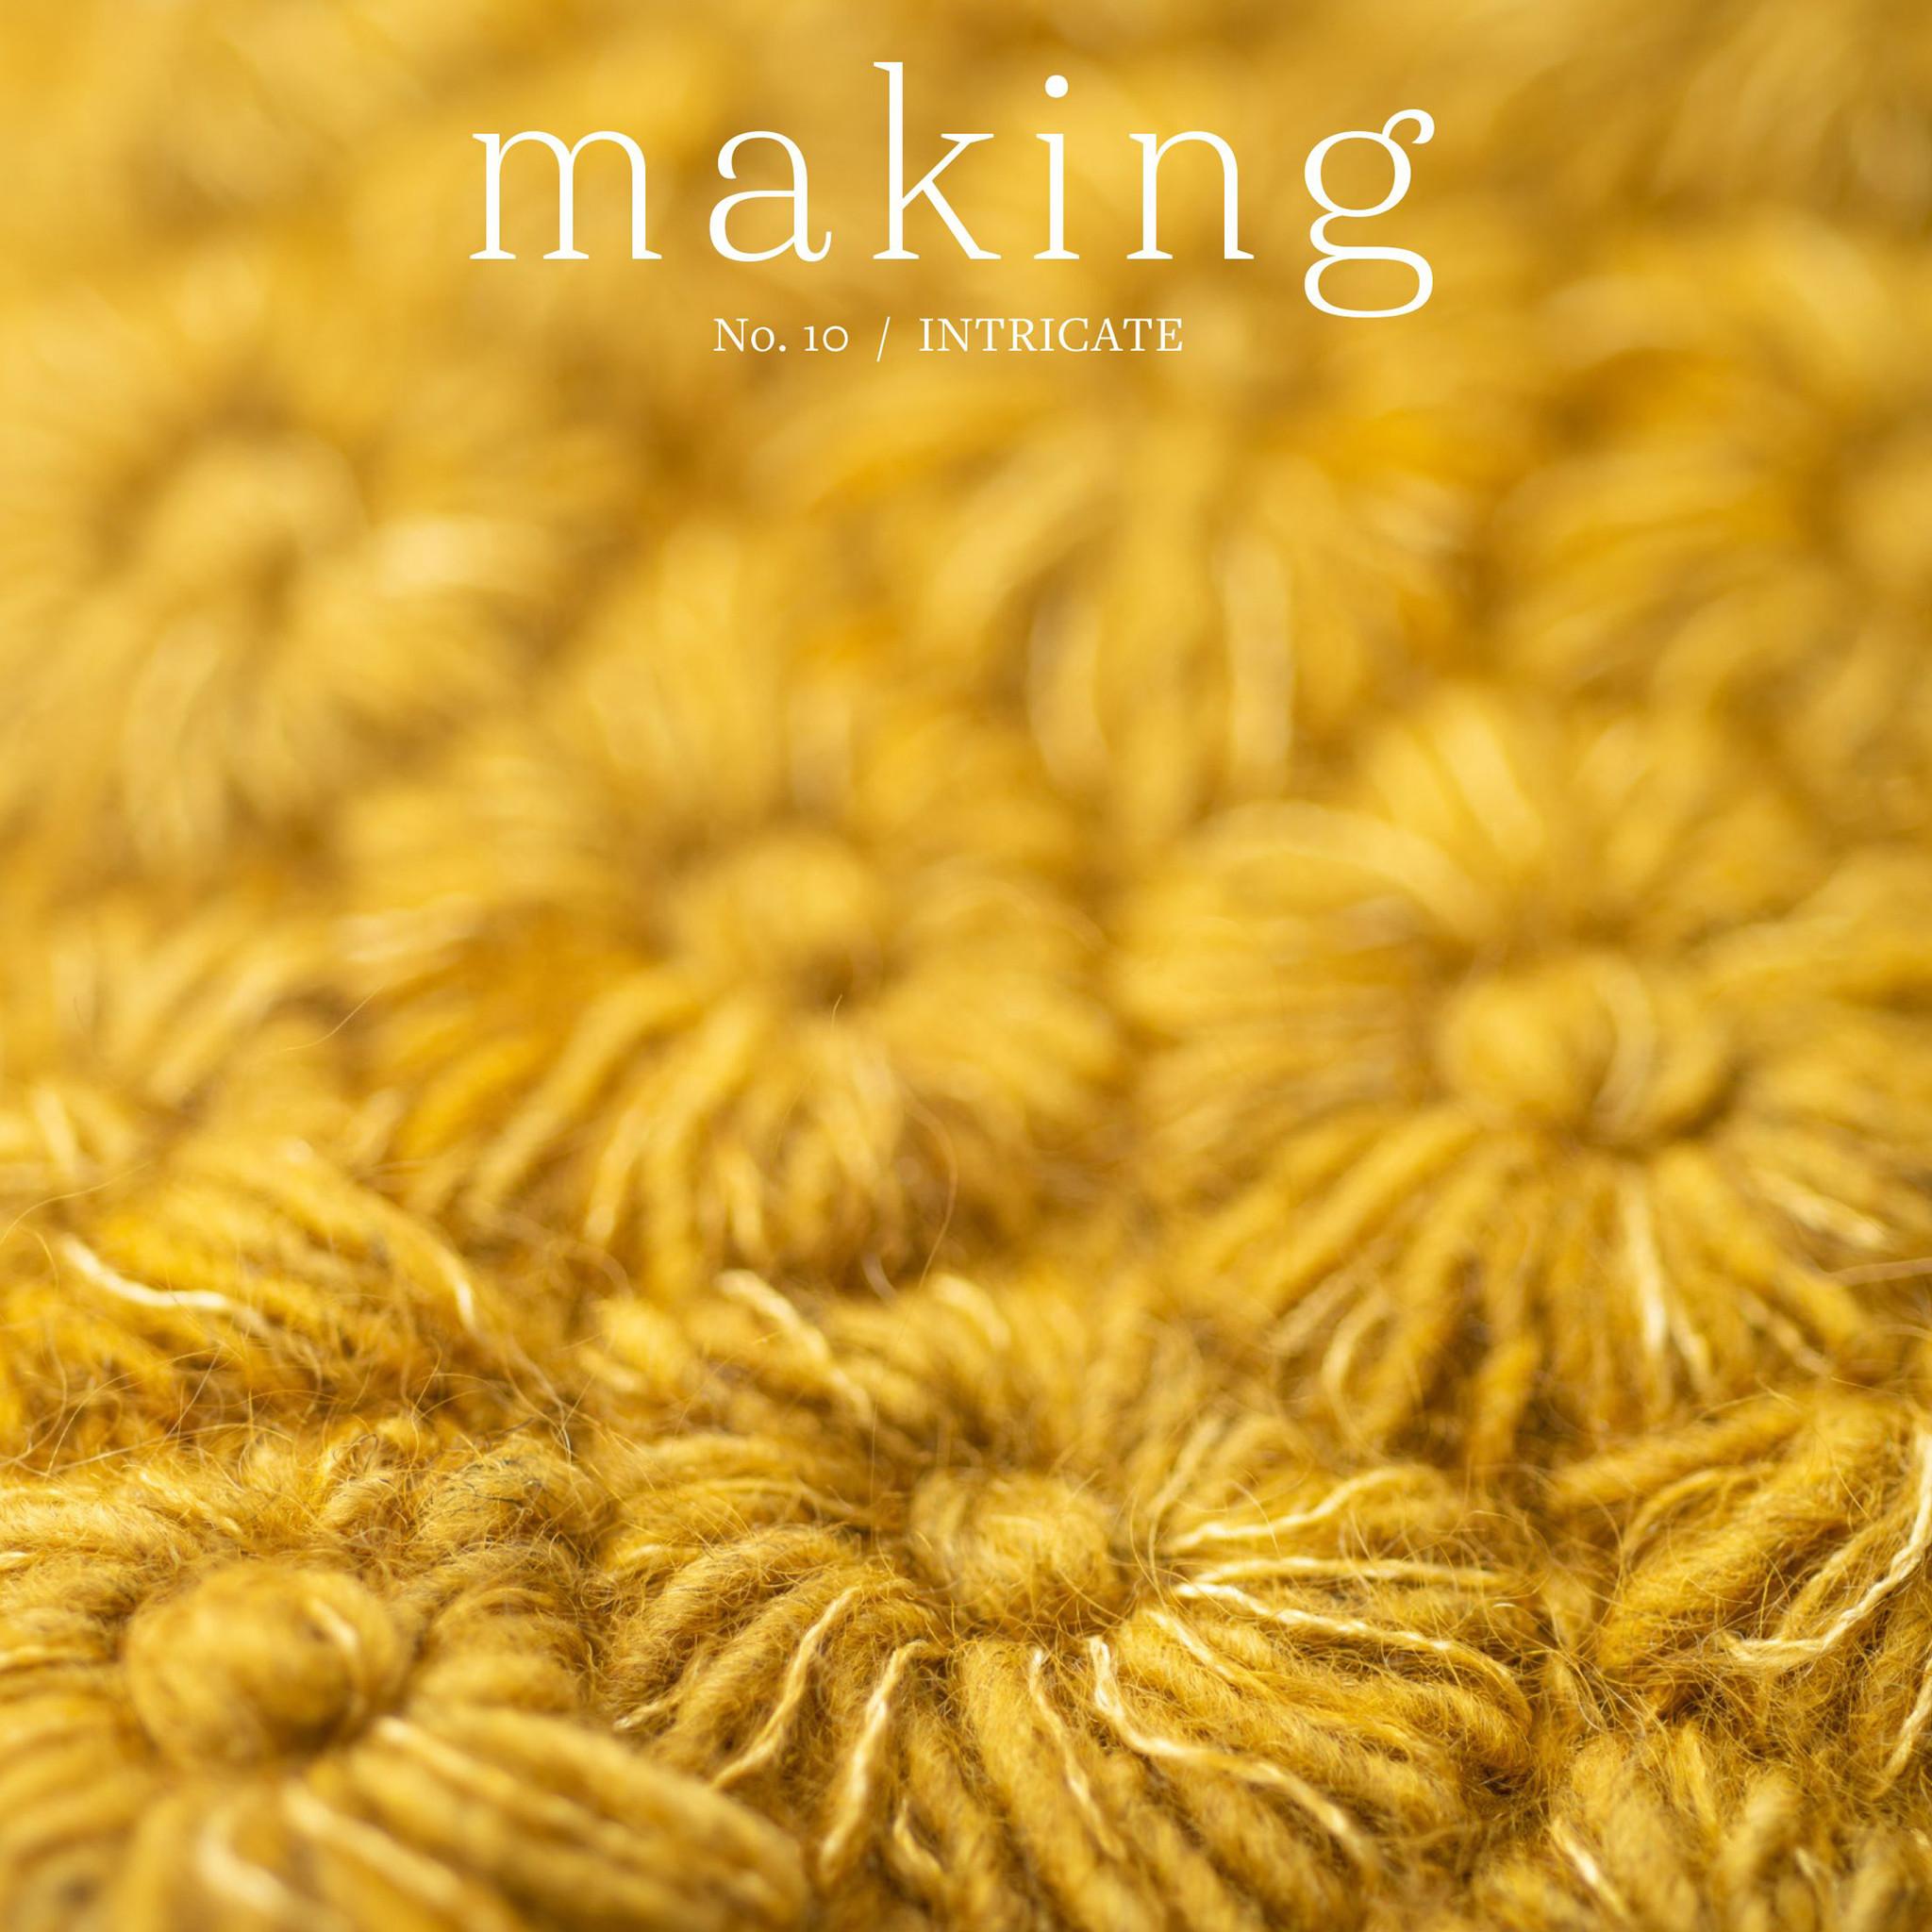 Making Magazine : No. 10 Intricate